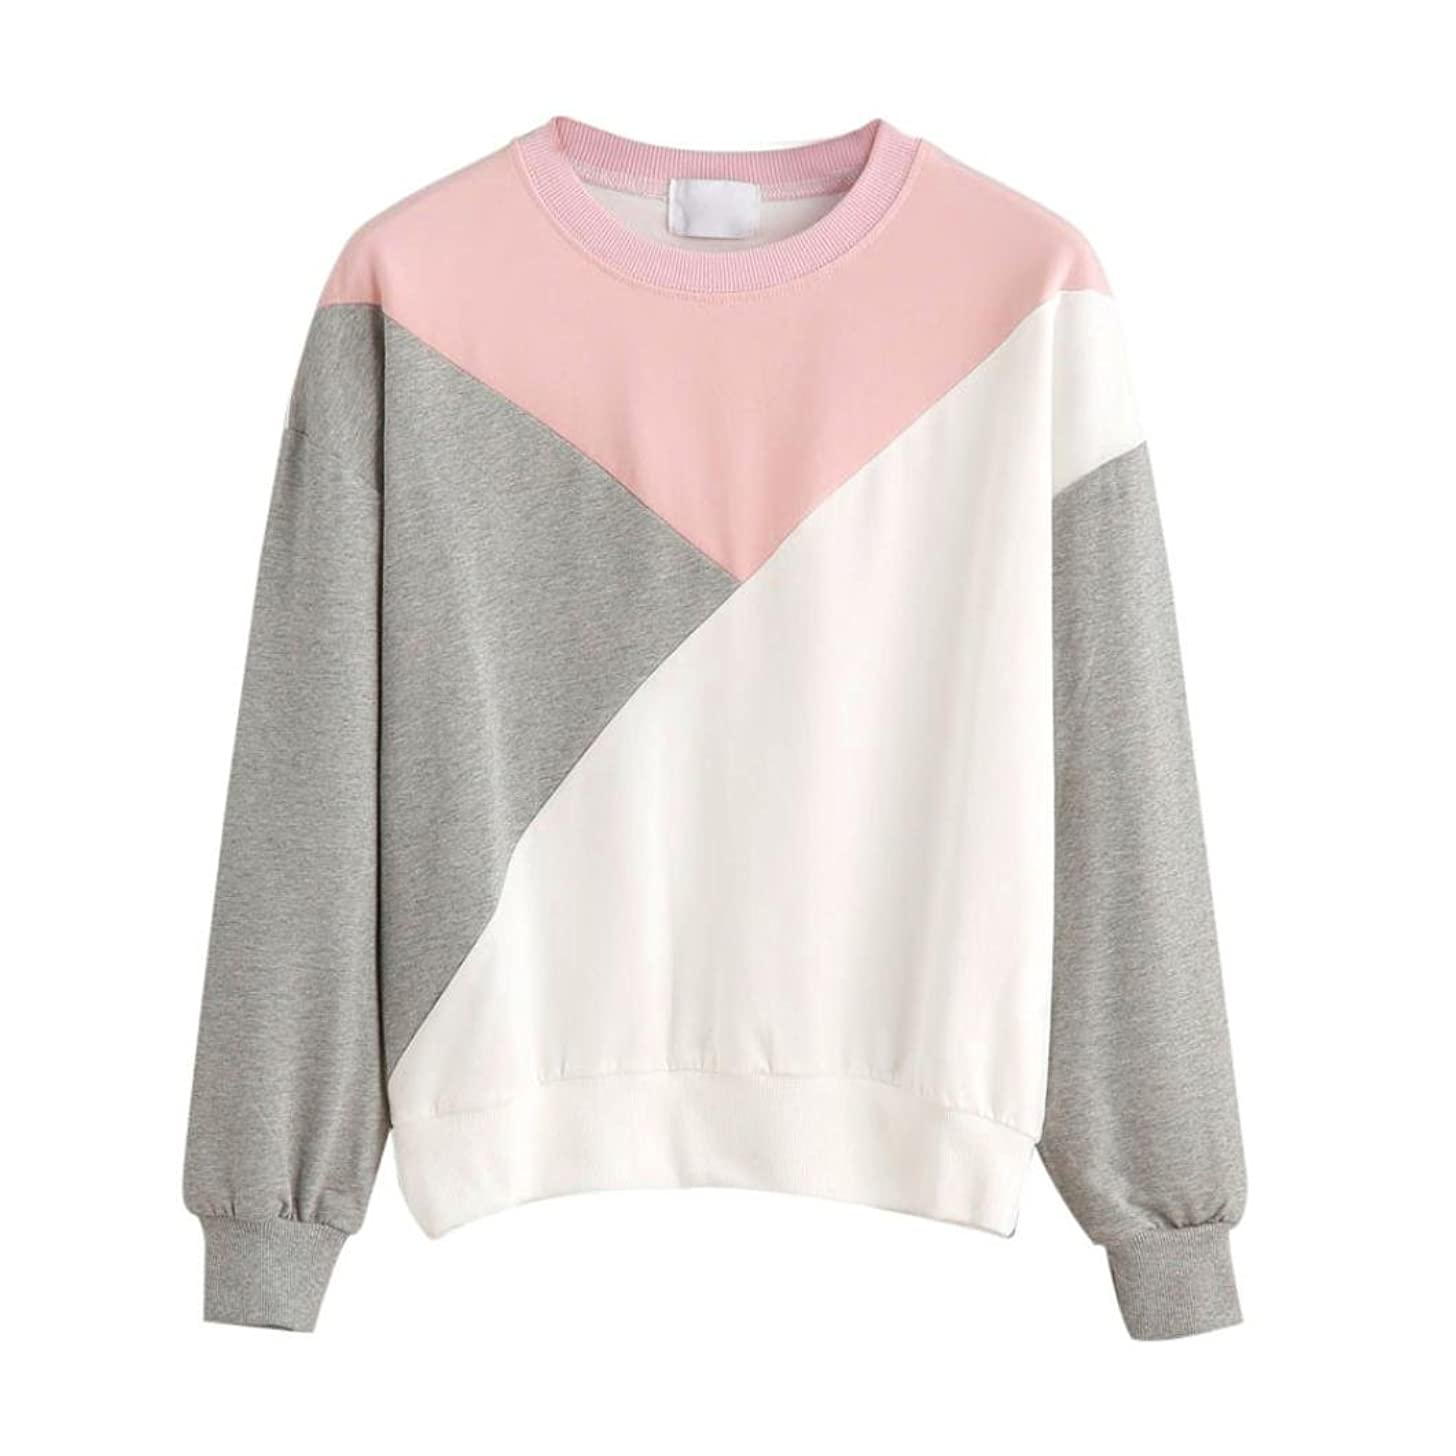 Keepfit Women Splice Sweatshirt Round Neck Casual Pullover Hoodless Blouse Tops